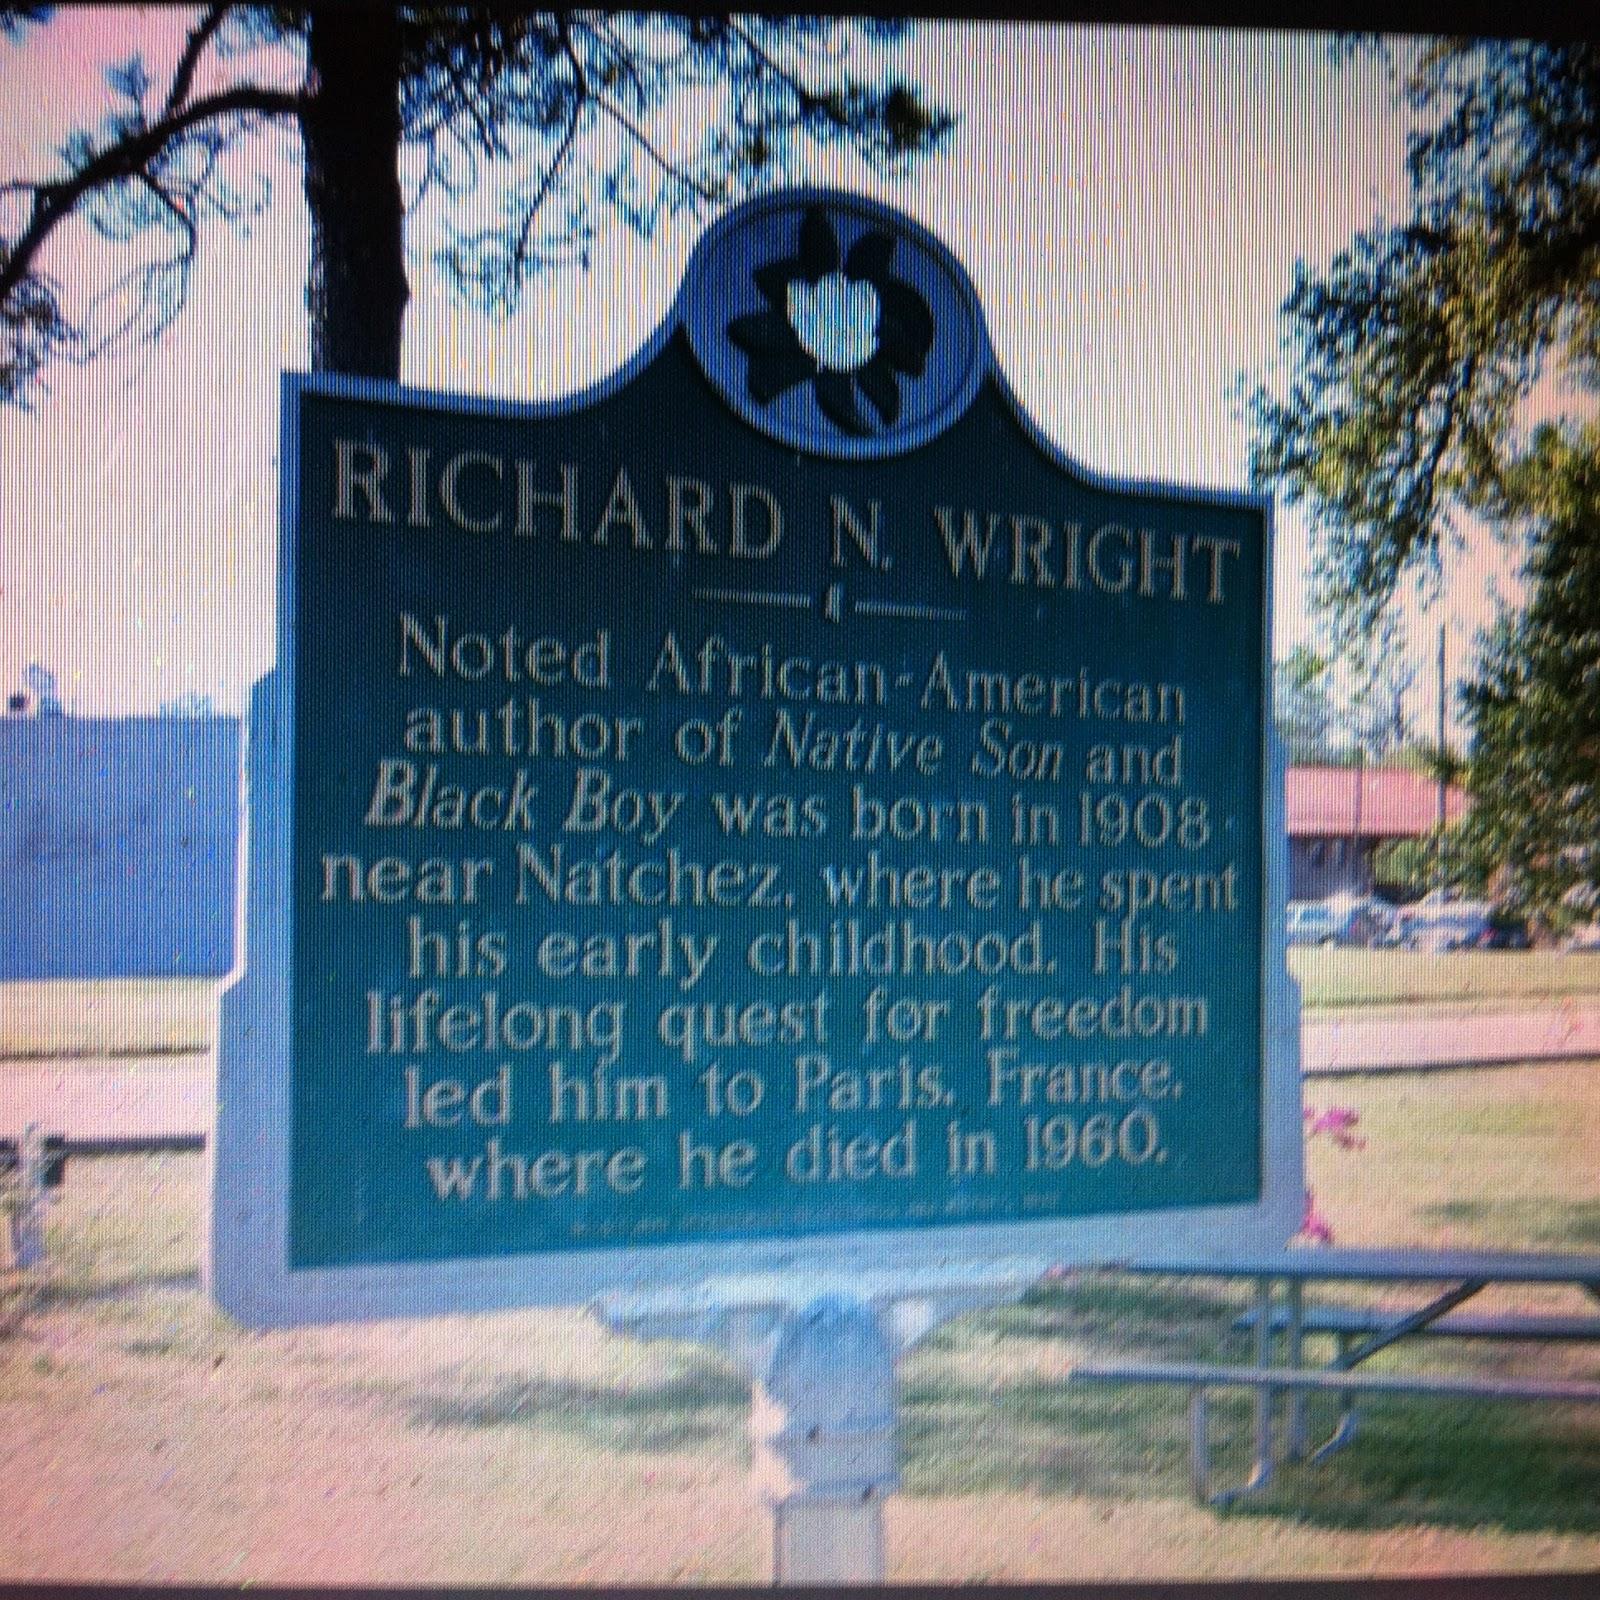 richard wright essay the ethics of living jim crow 9733 research richard wright essay the ethics of living jim crow